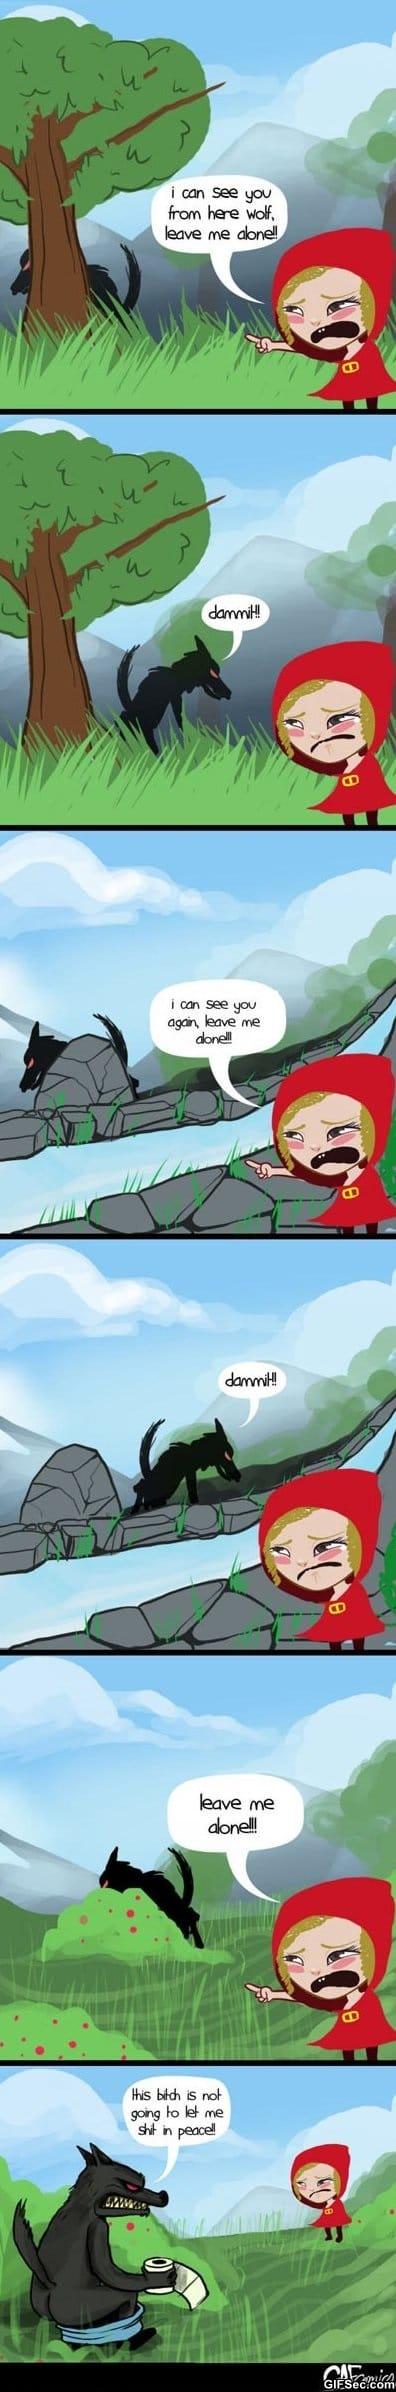 comics-little-red-riding-hood